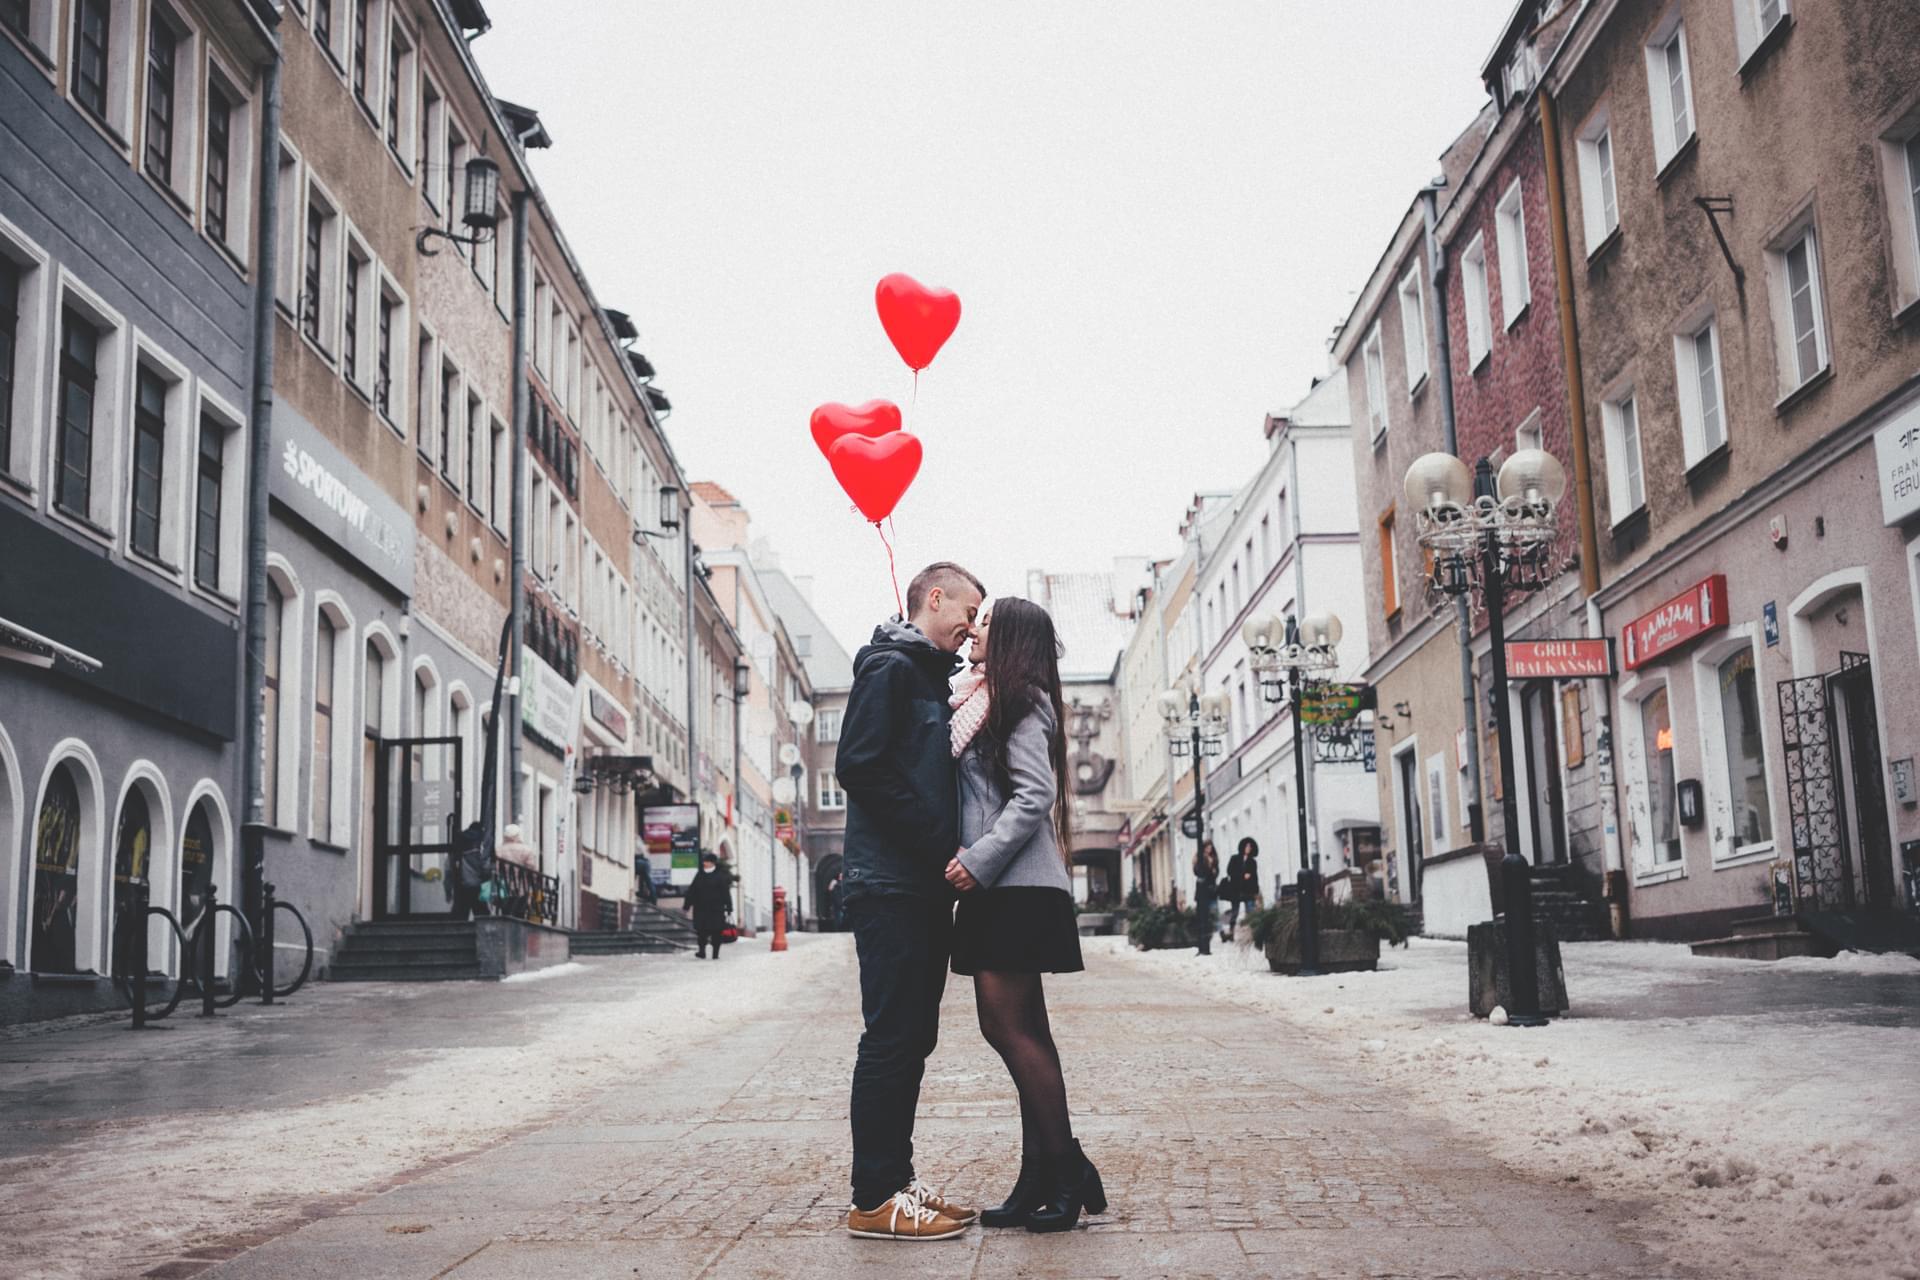 Valentine's Day Weekend in Annapolis